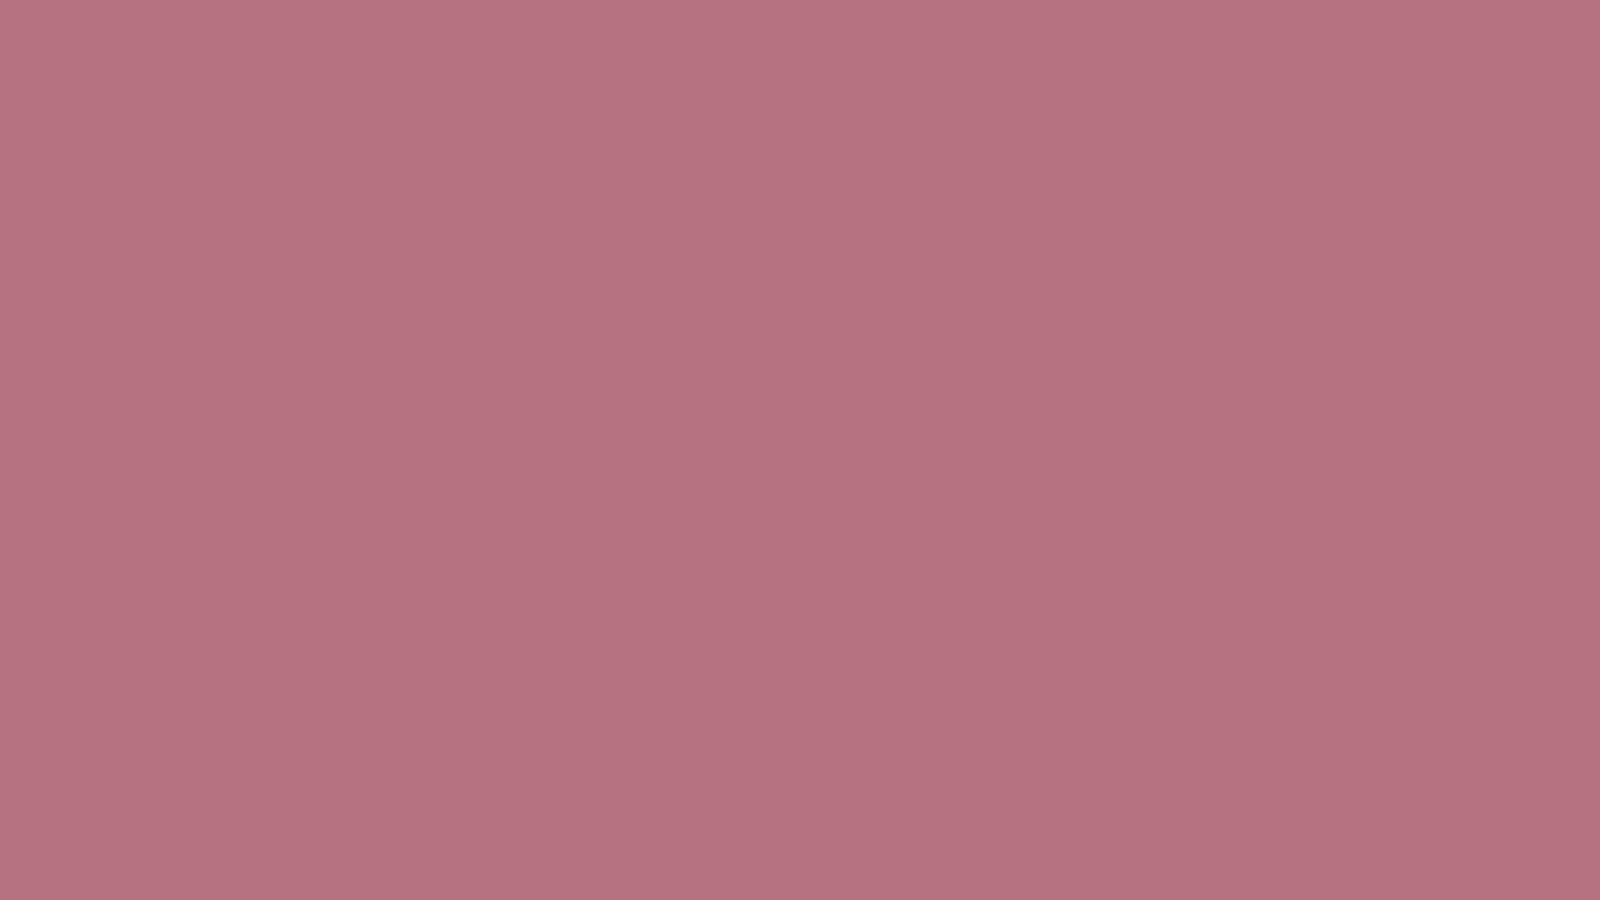 1600x900 Turkish Rose Solid Color Background